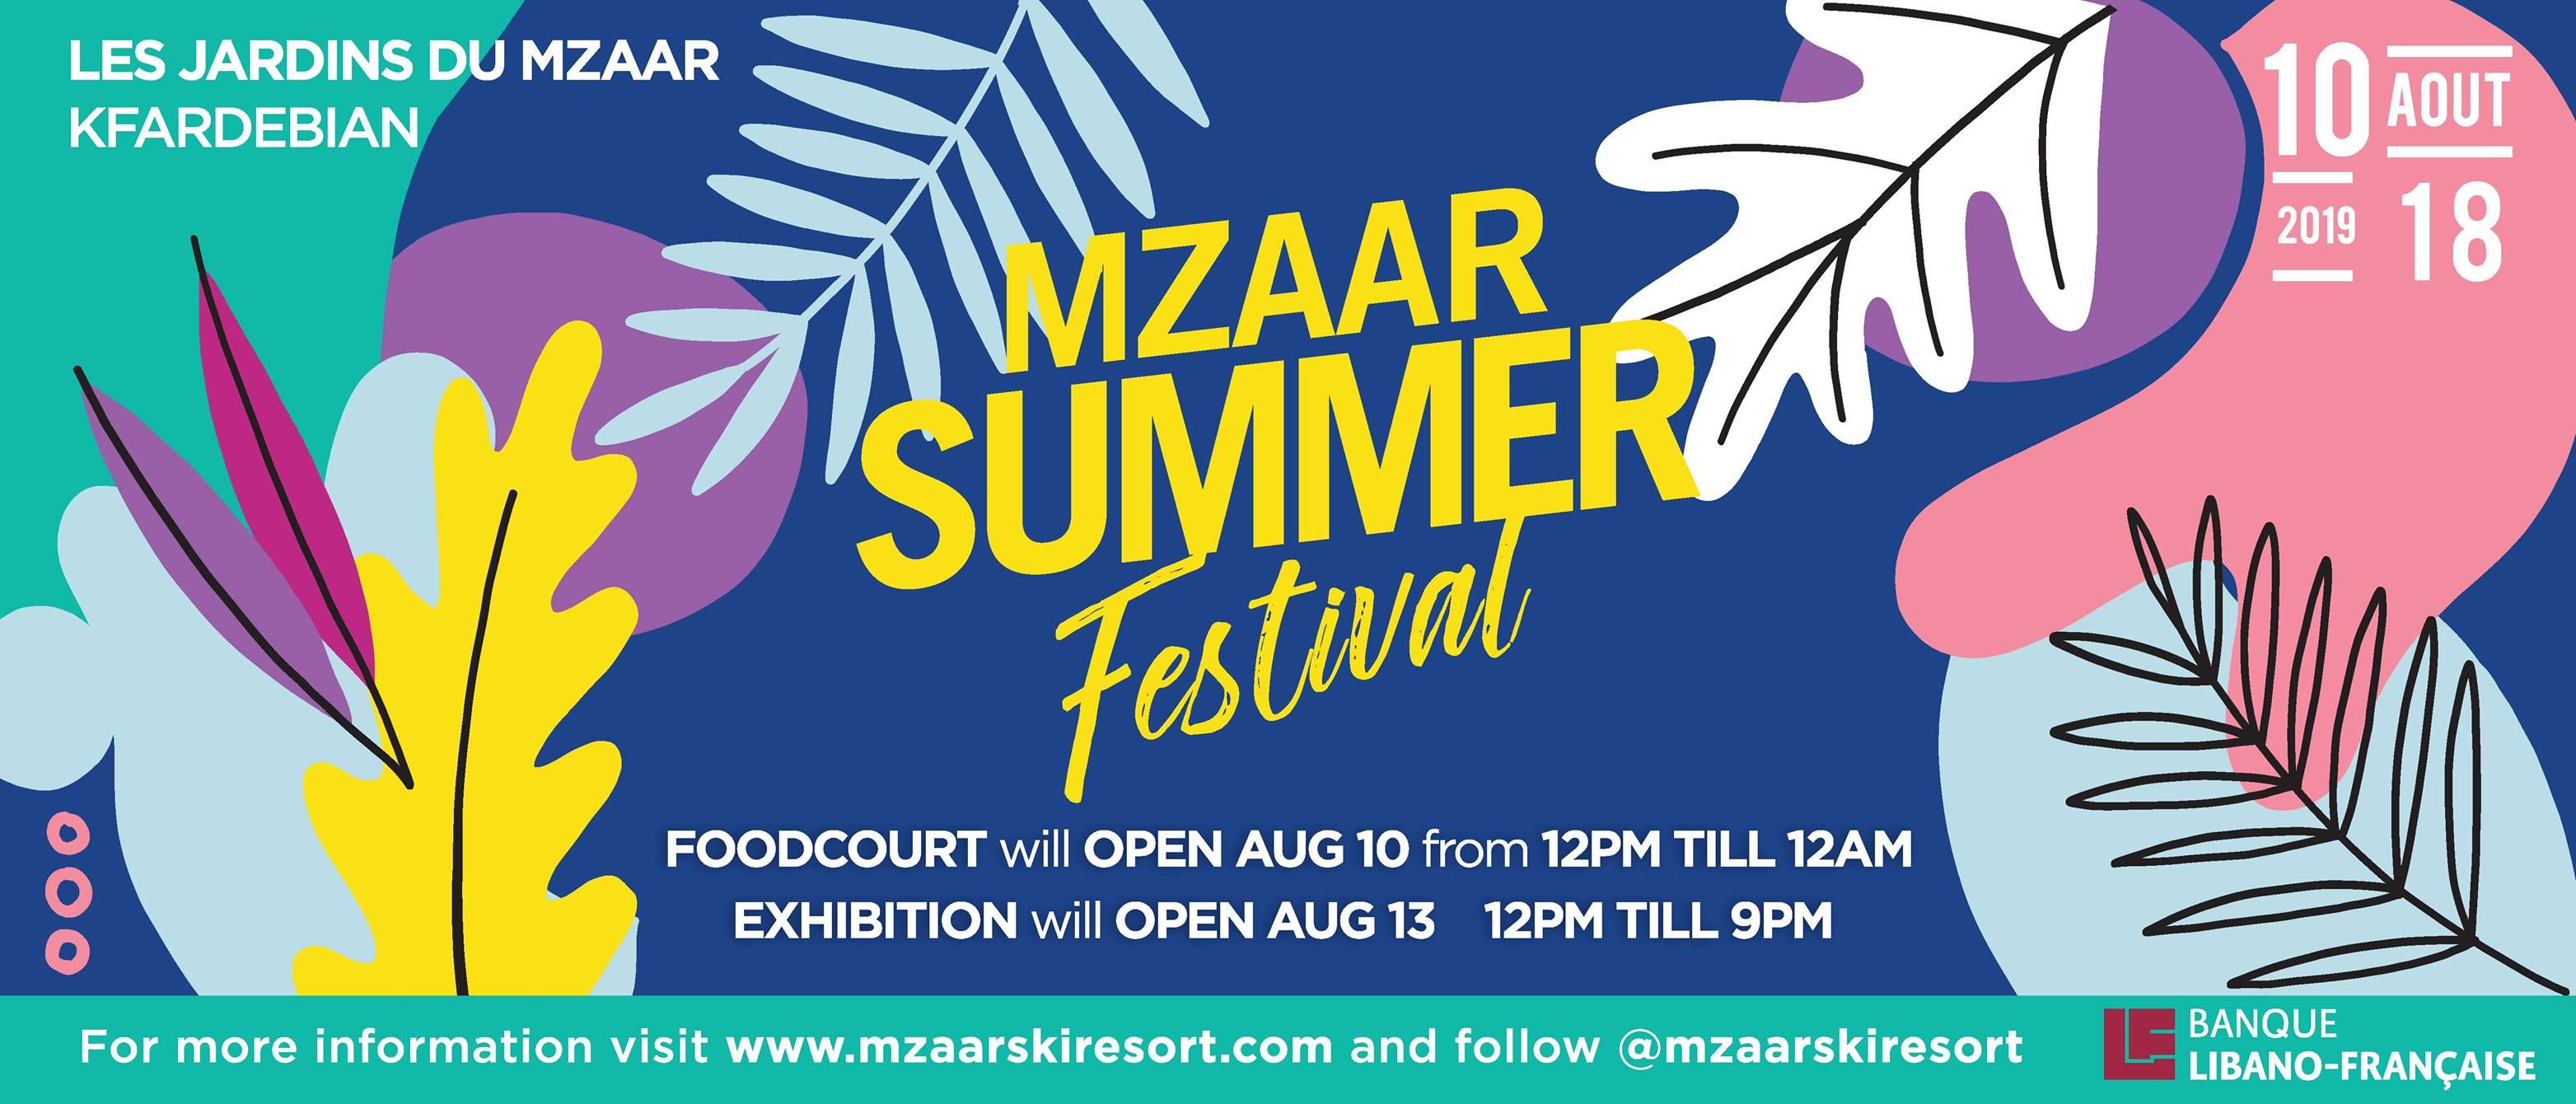 Mzaar Summer Festival